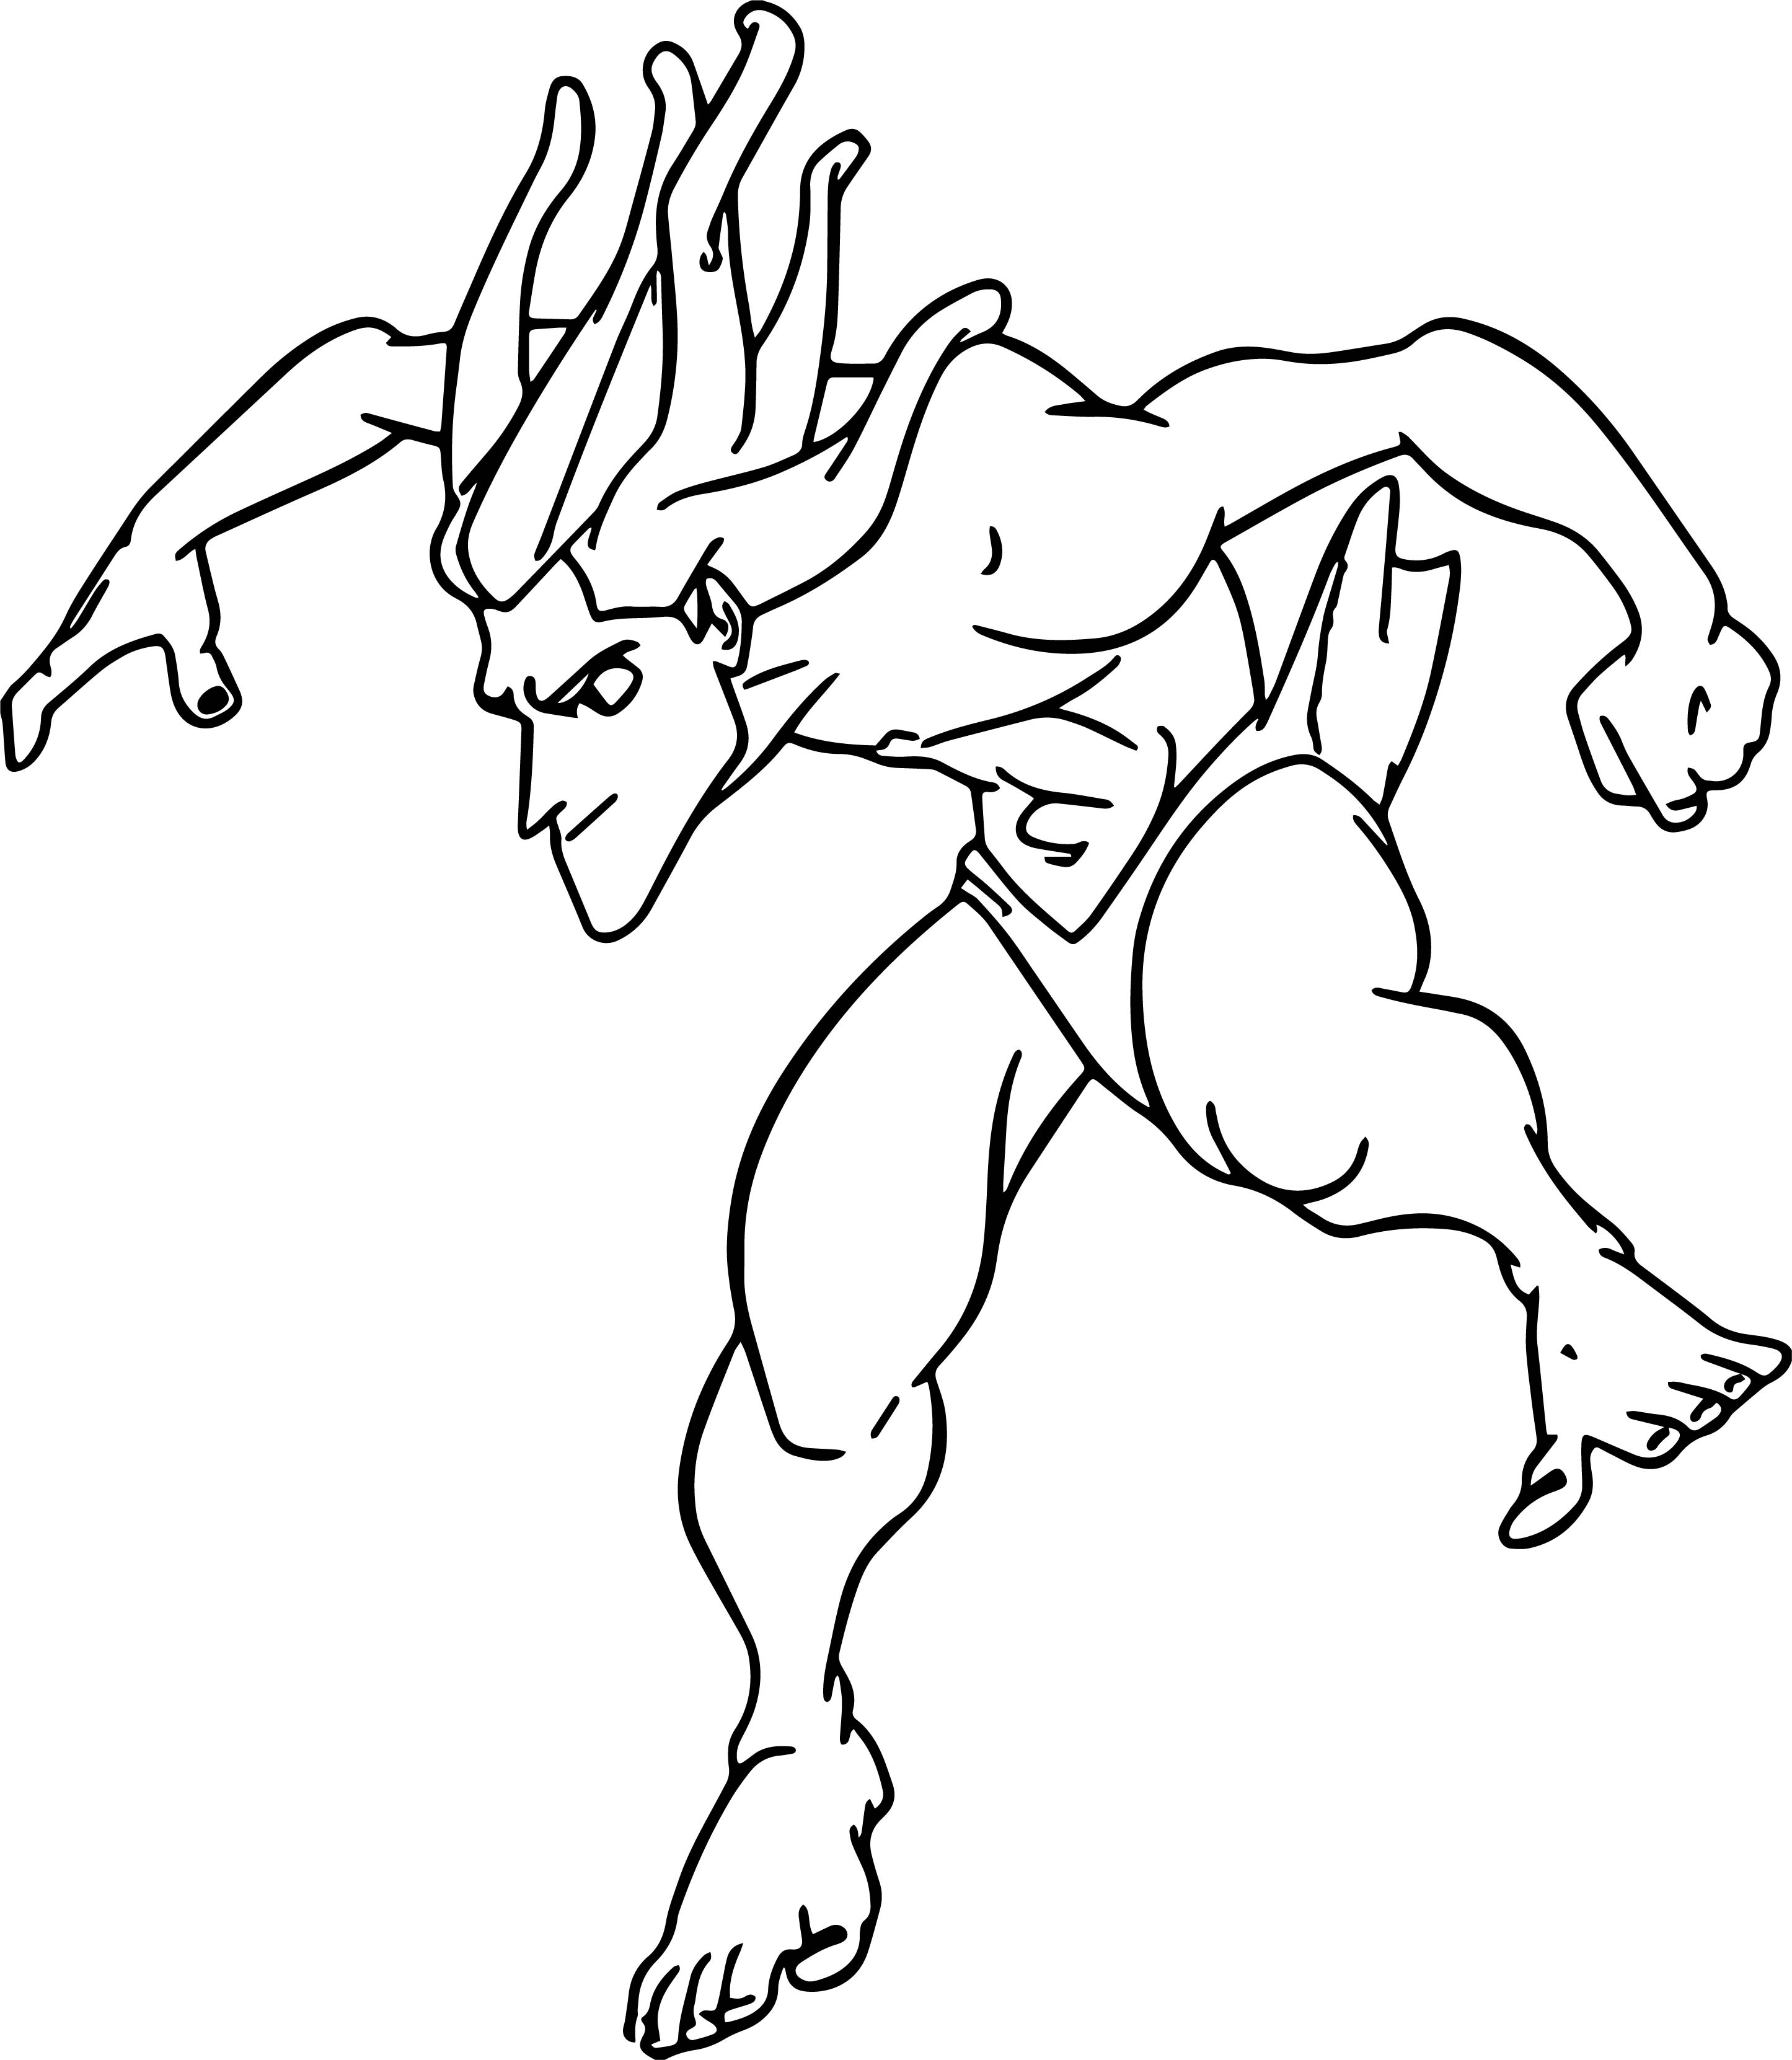 Tarzan Slide Coloring Page